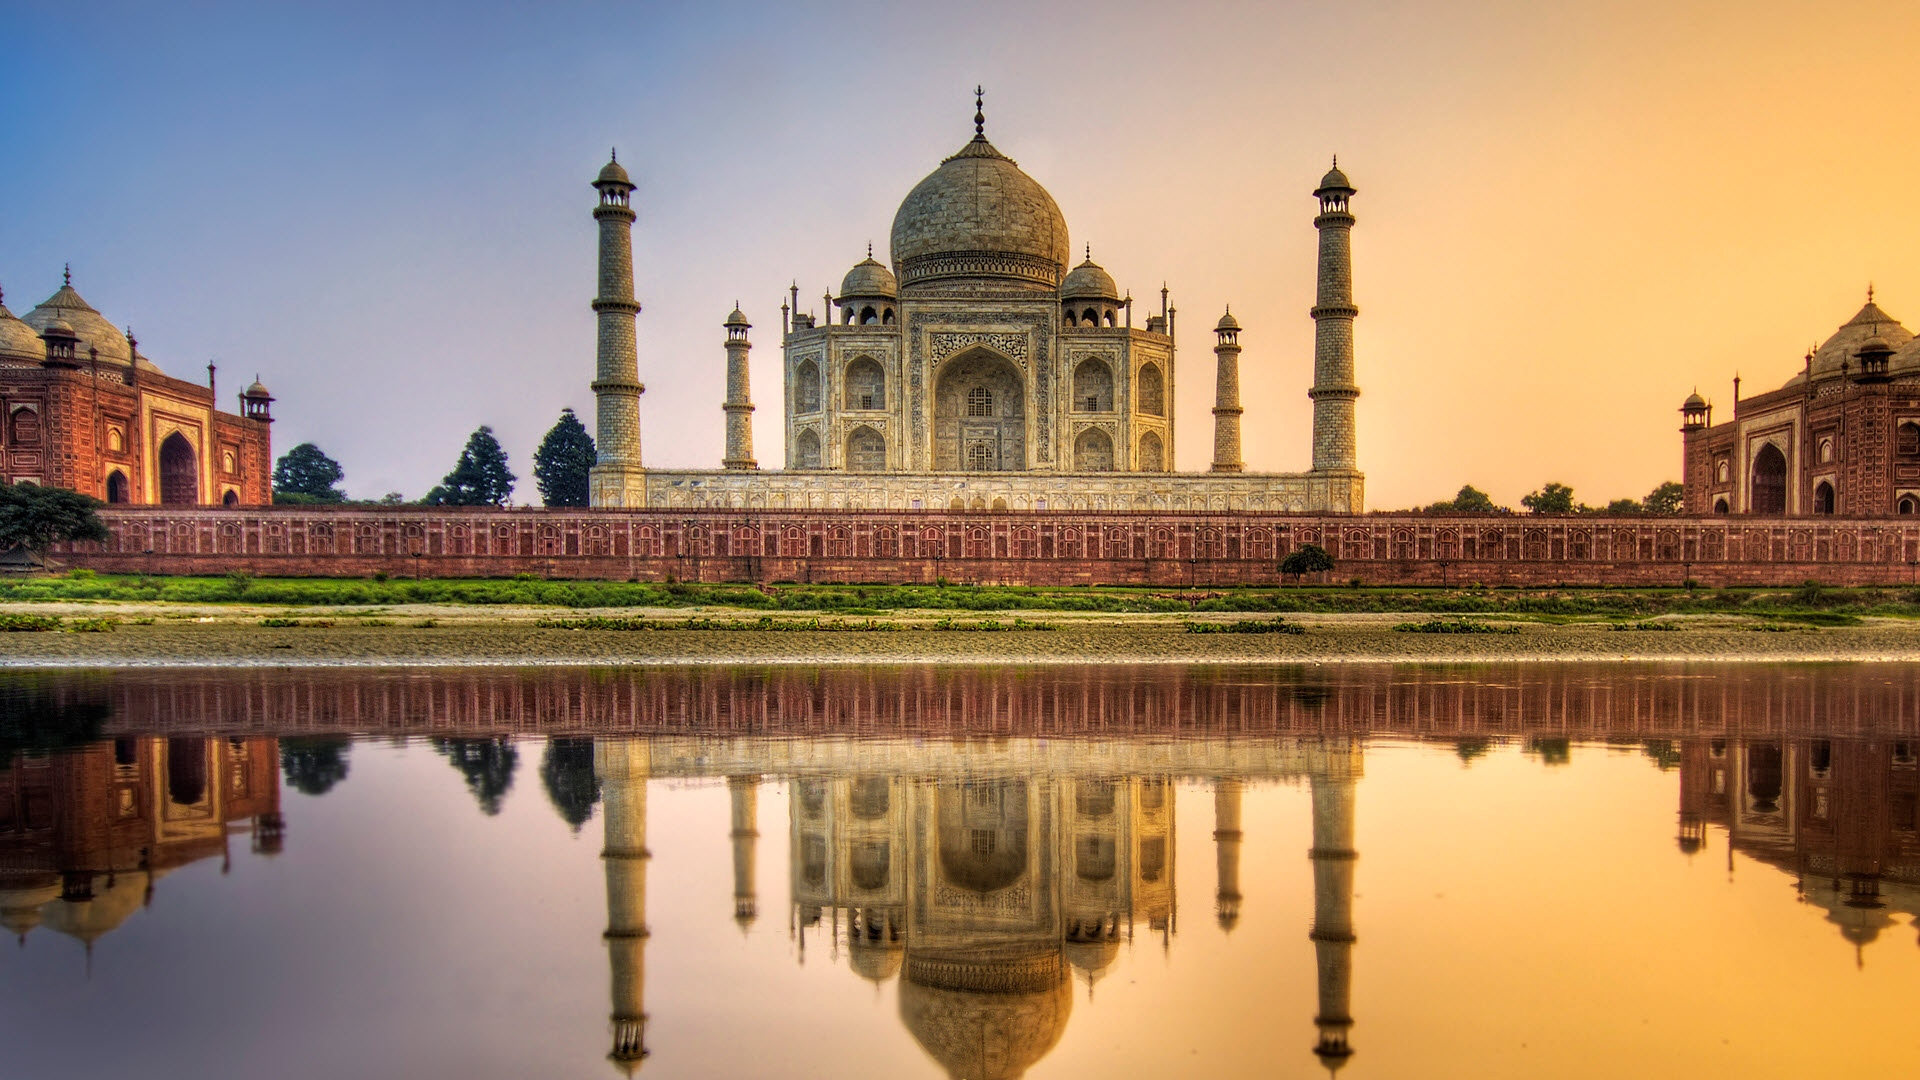 taj_mahal_agra_india_mausoleum_mosque_10904_1920x1080